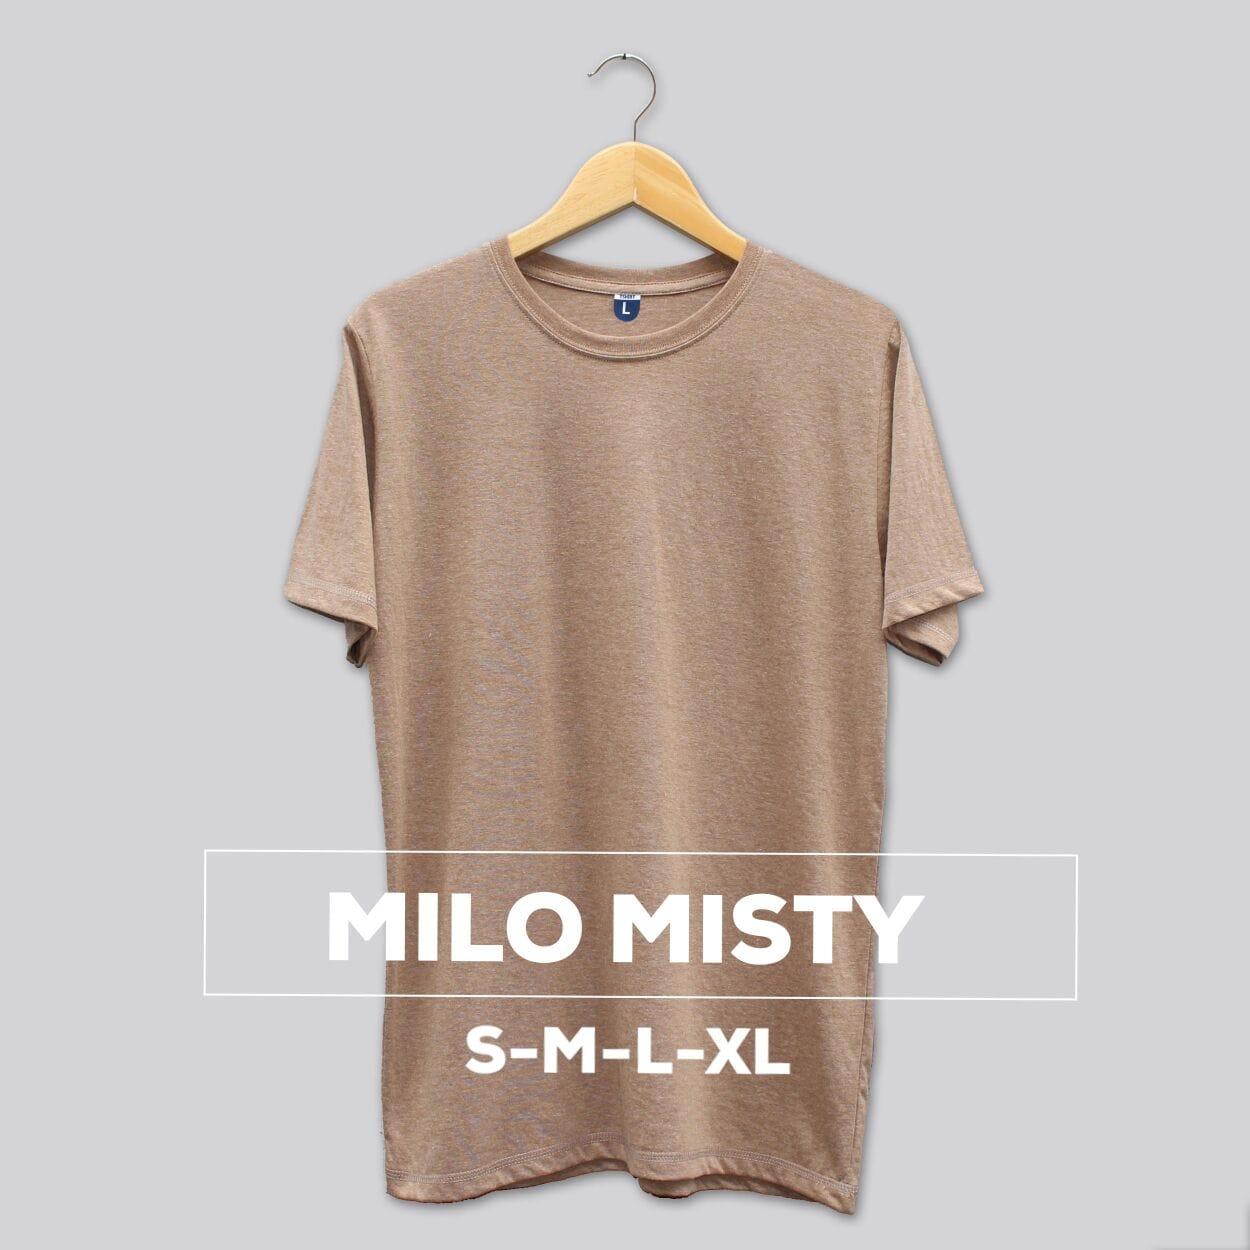 Jual Kaos Polos Tshirt Milo Misty Black